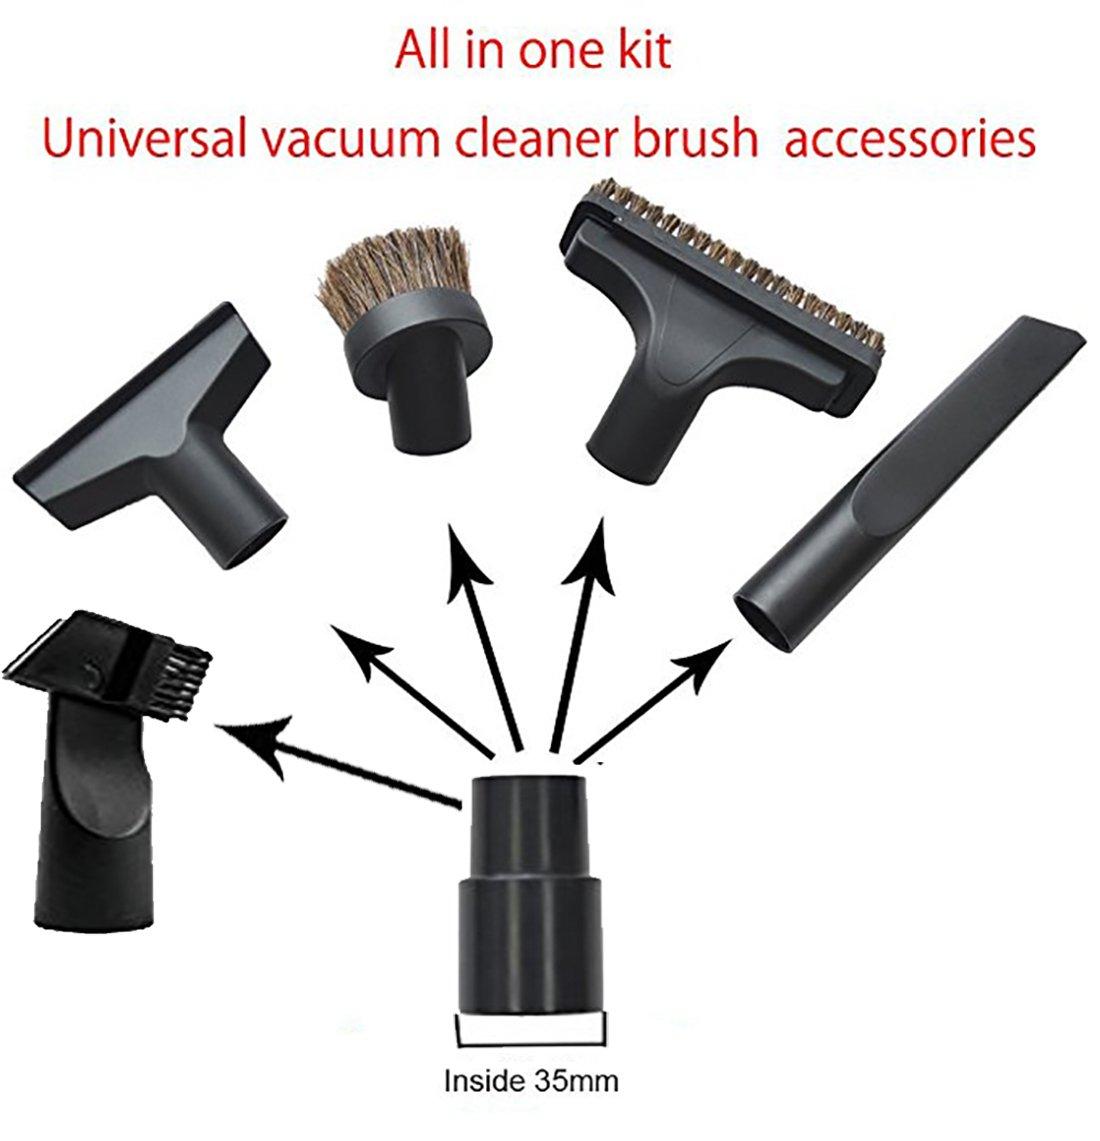 Amazon.com: Wonlives - Kit de cepillo universal de repuesto ...